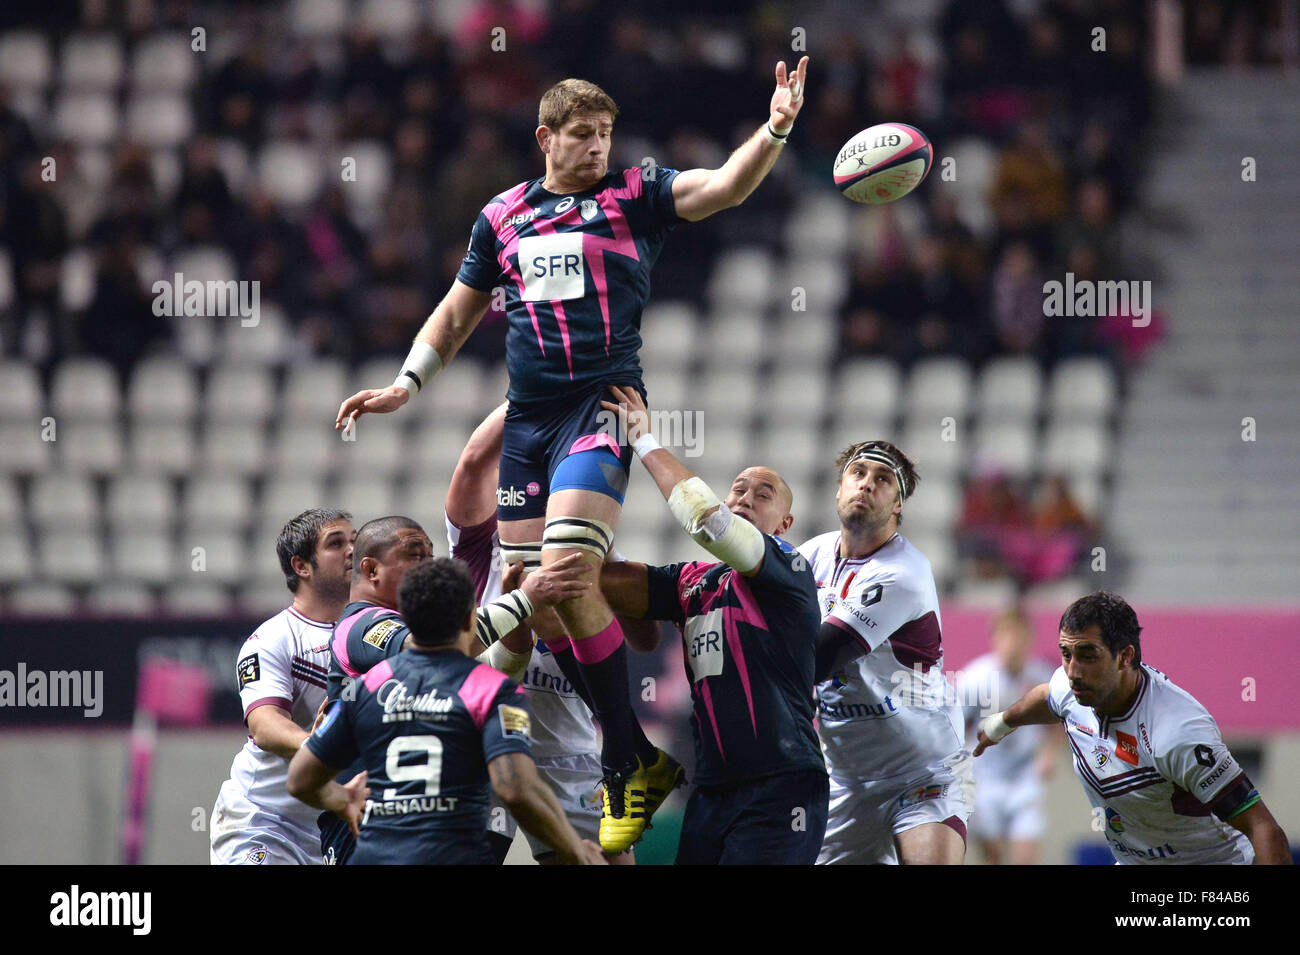 Parigi, Francia. 05 Dic, 2015. Top 14 Rugby Union. Stade Francais contro il Bordeaux Begles. PASCAL PAPE (sf) vince Immagini Stock